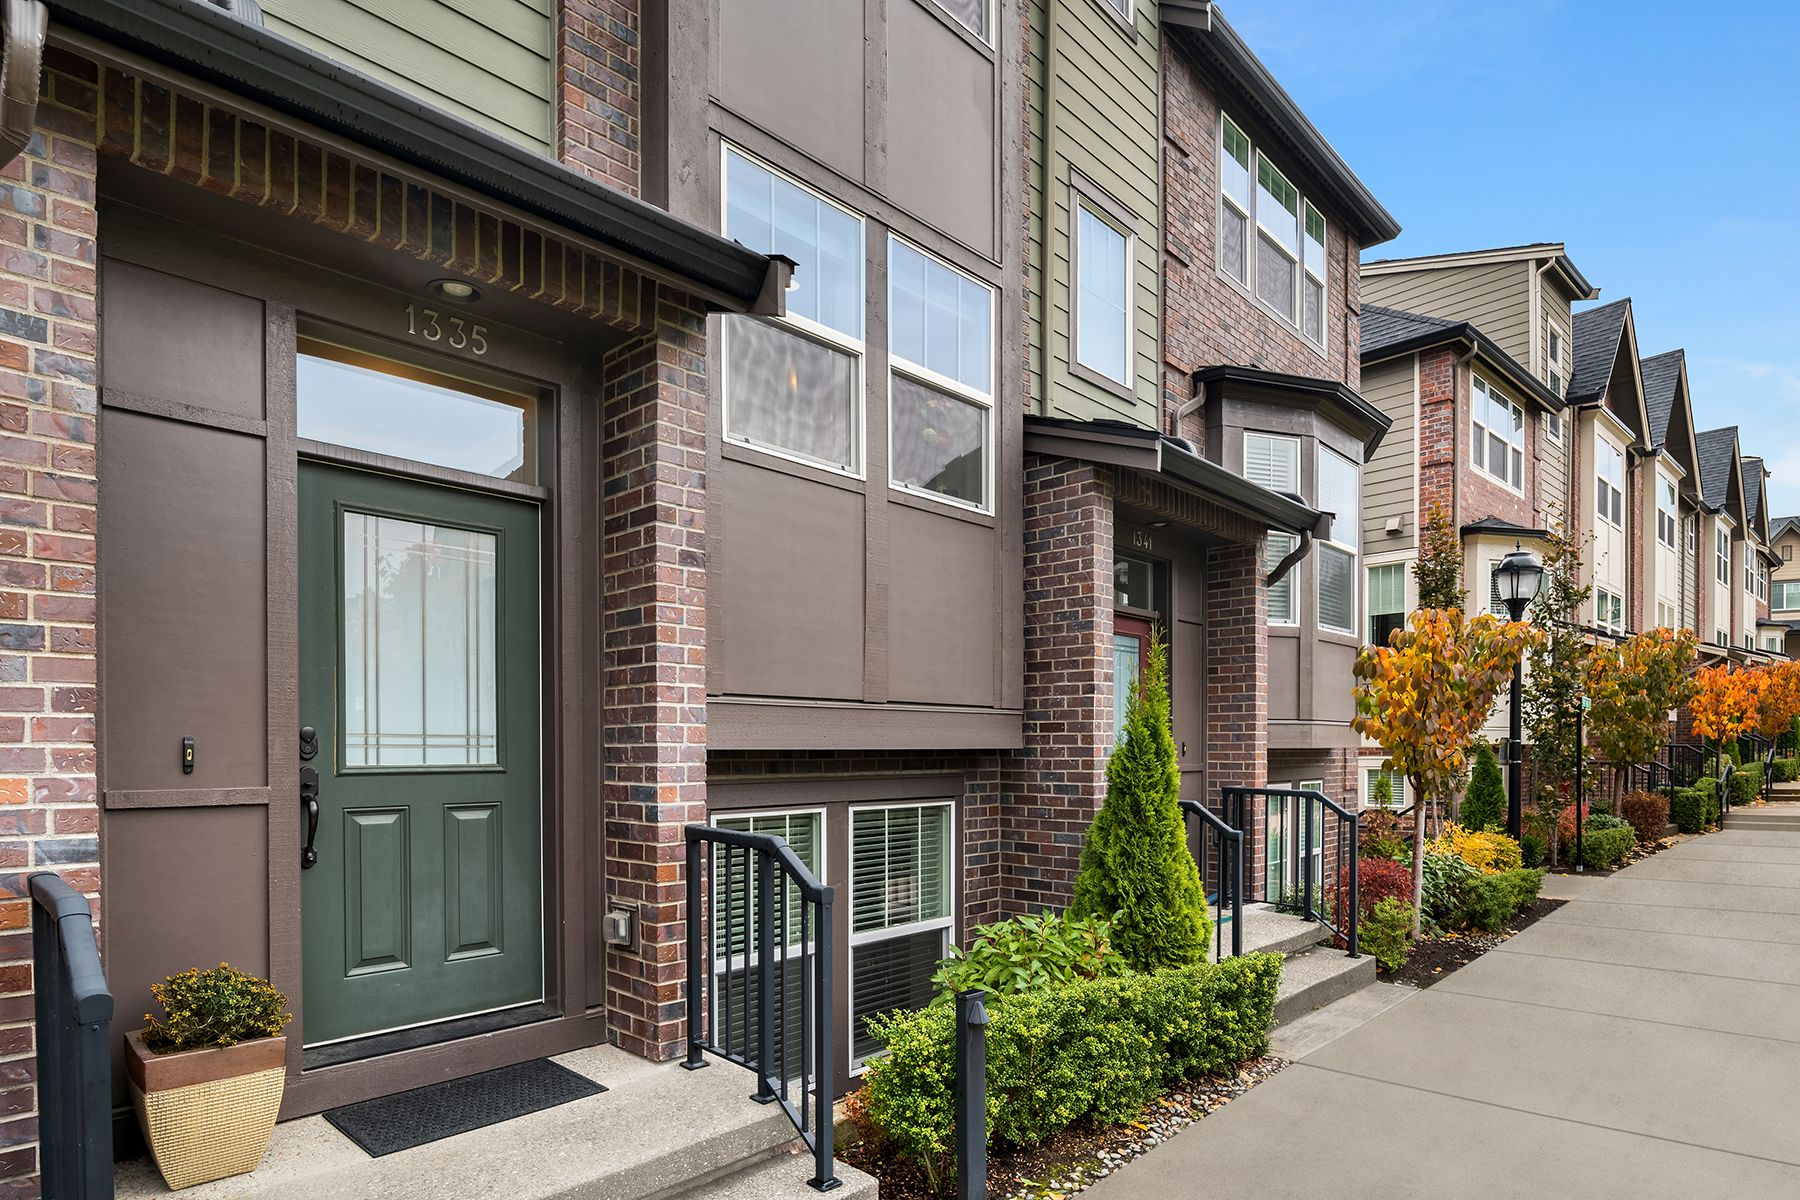 Condominiums for Sale at 1335 Greenwich Walk NE, Issaquah, WA 98029 1335 Greenwich Walk NE Issaquah, Washington 98029 United States